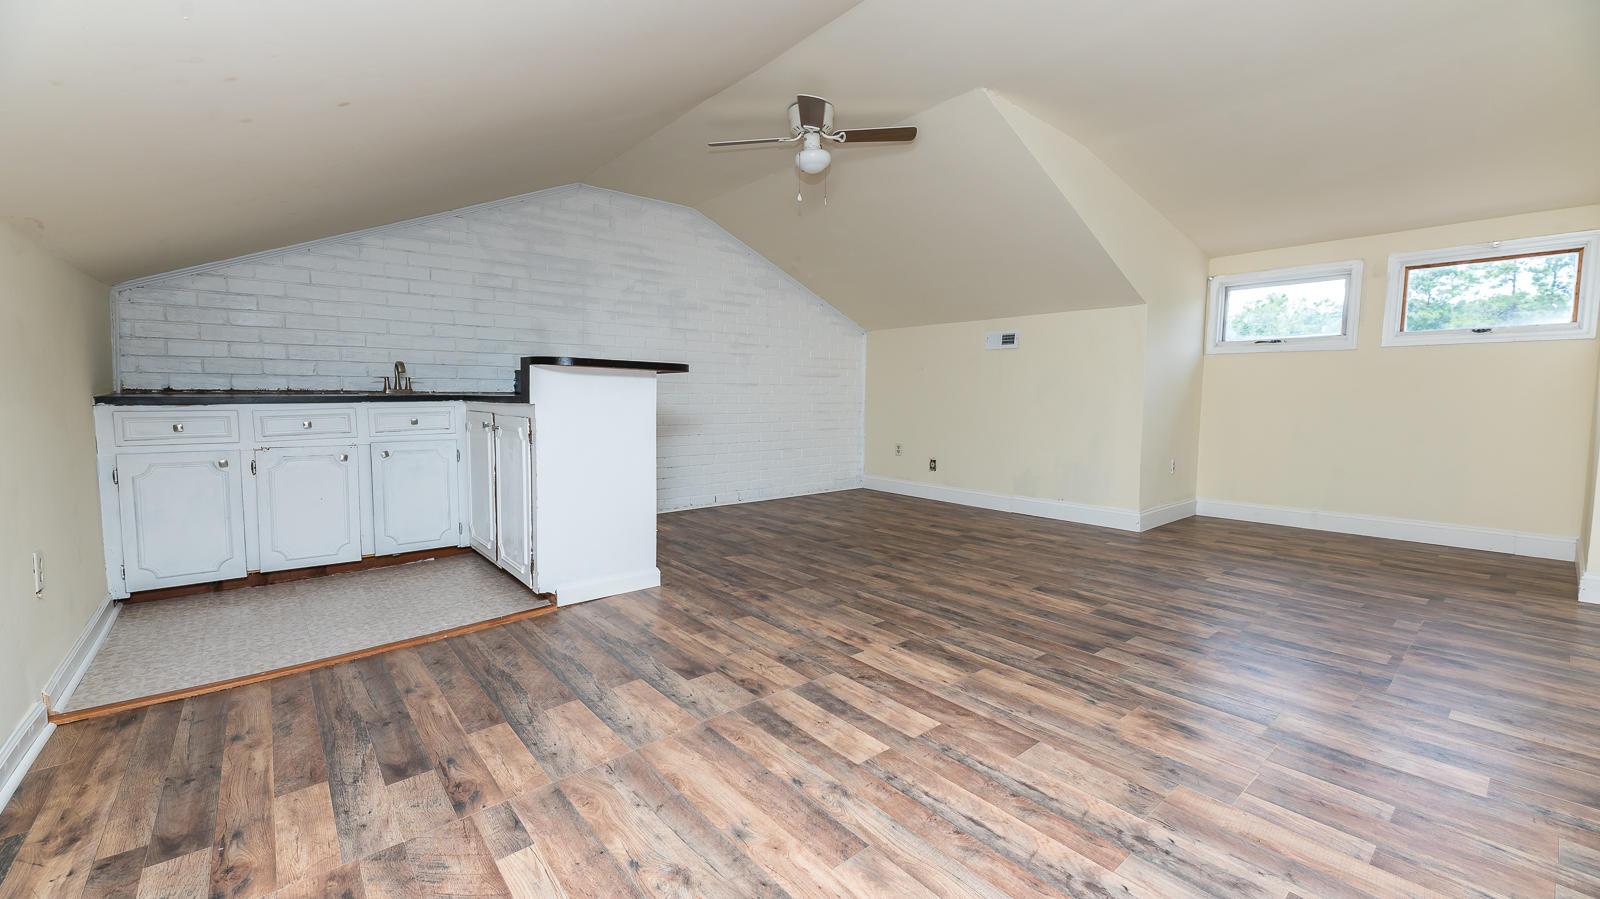 Ashley Villas Homes For Sale - 4315 Briarstone, North Charleston, SC - 13